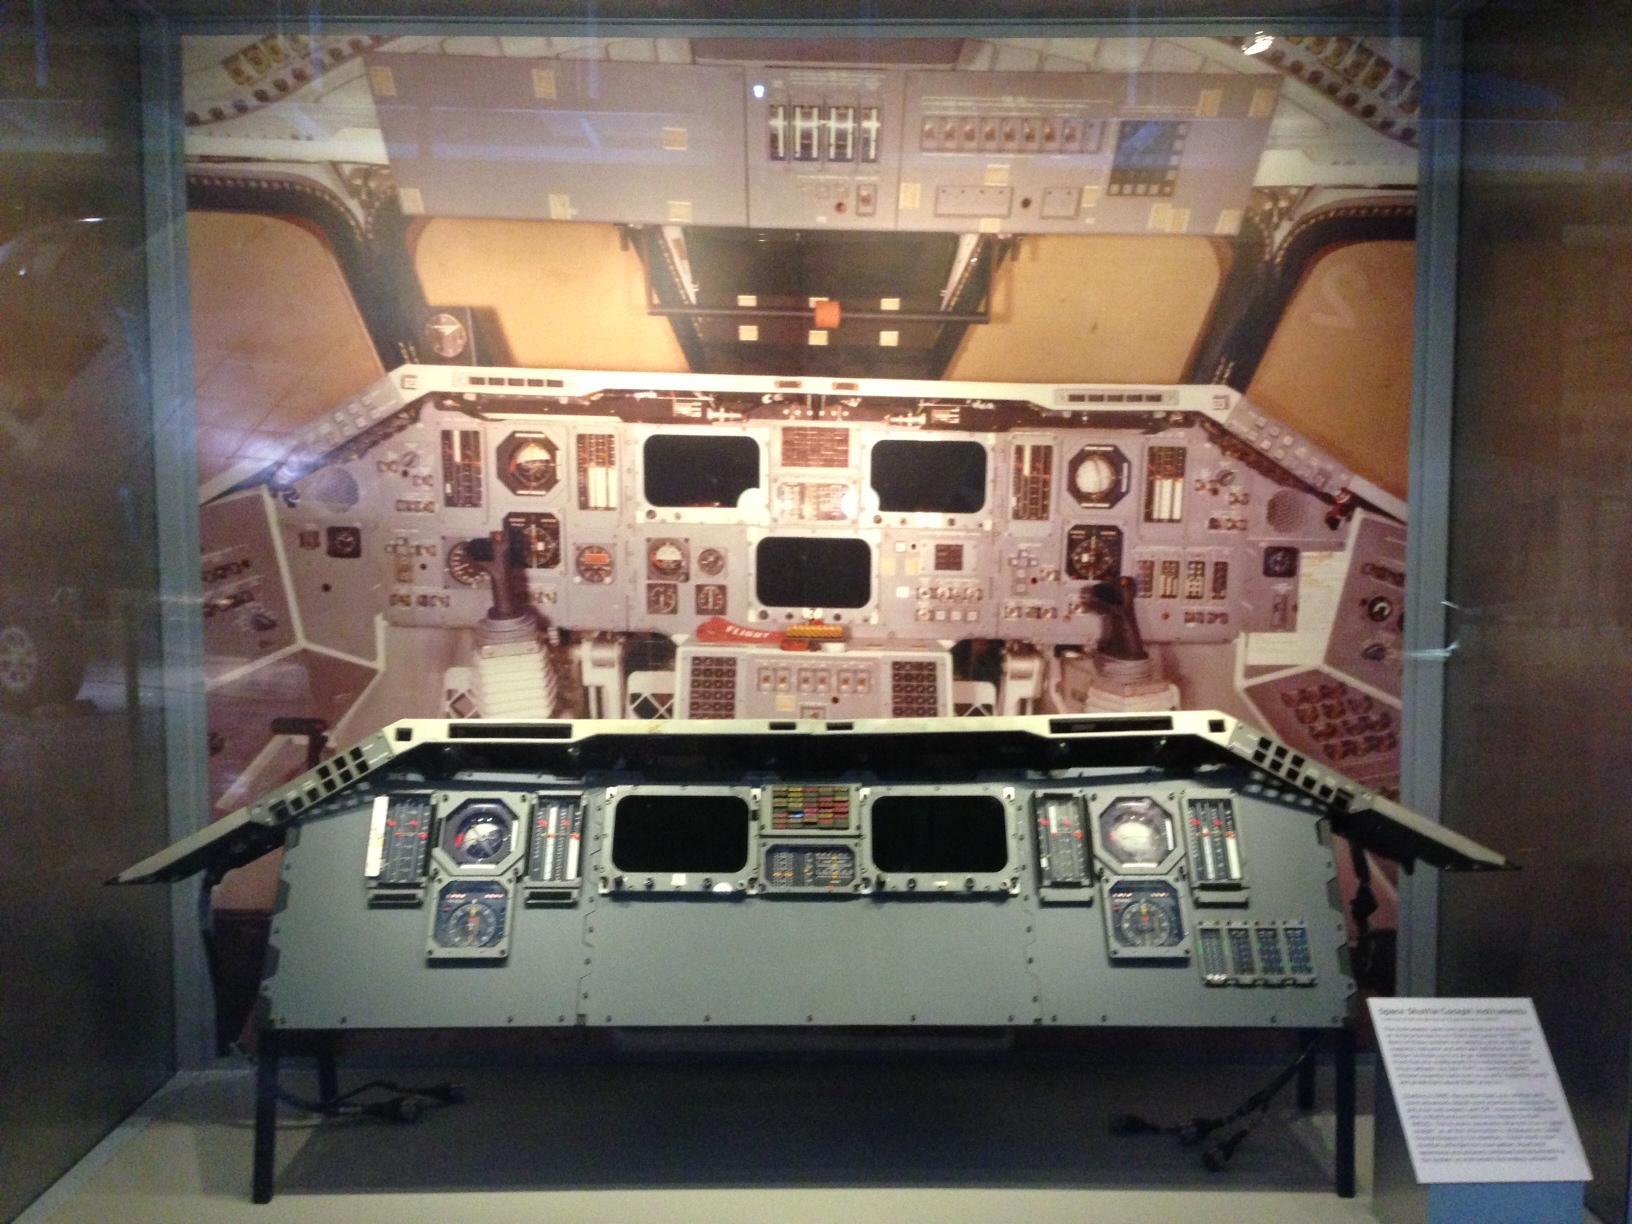 NYC Museum Launches New Space Shuttle Enterprise Exhibit